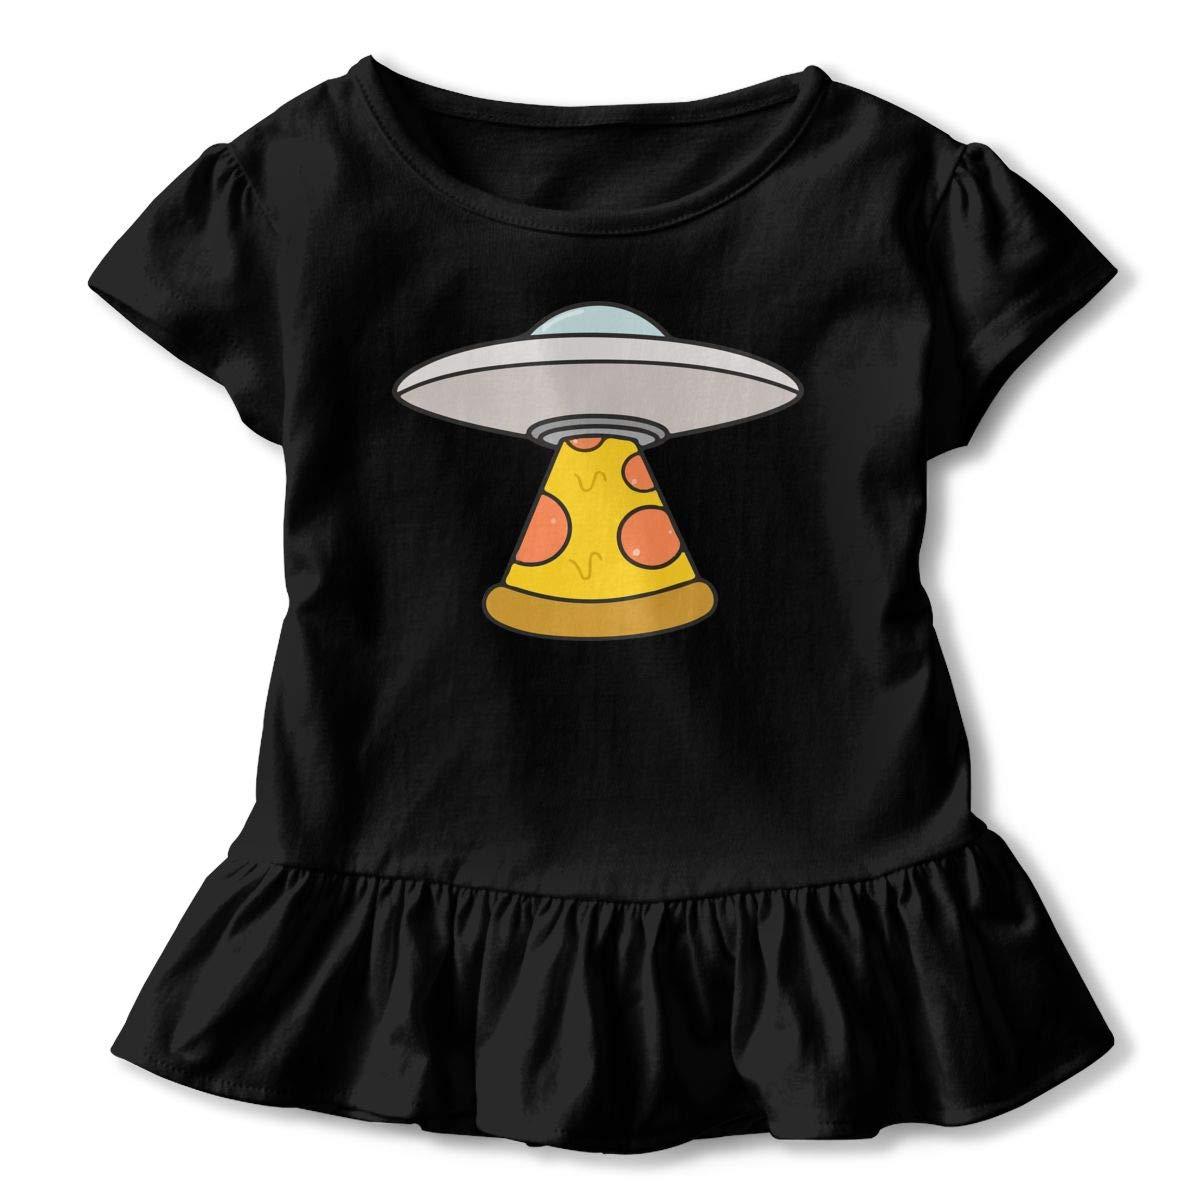 Kawaii Pizza UFO Childrens Girls Short Sleeve T Shirts Ruffles Shirt T-Shirt for 2-6T